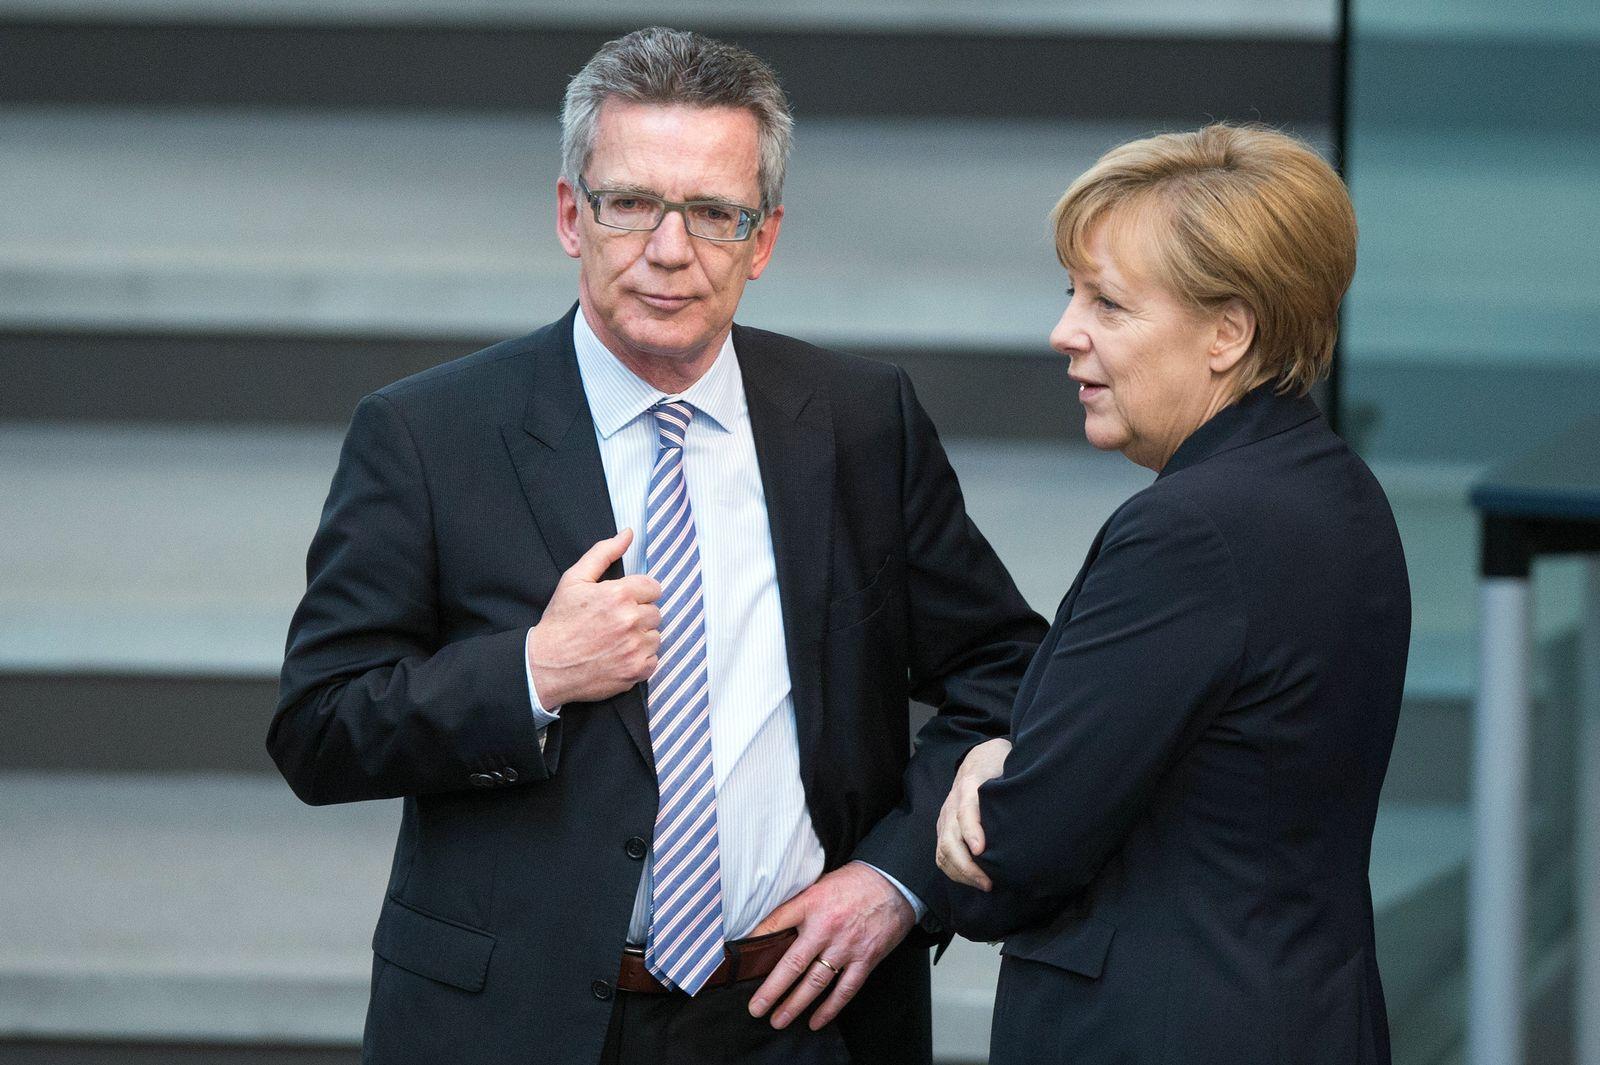 Merkel de Maizière